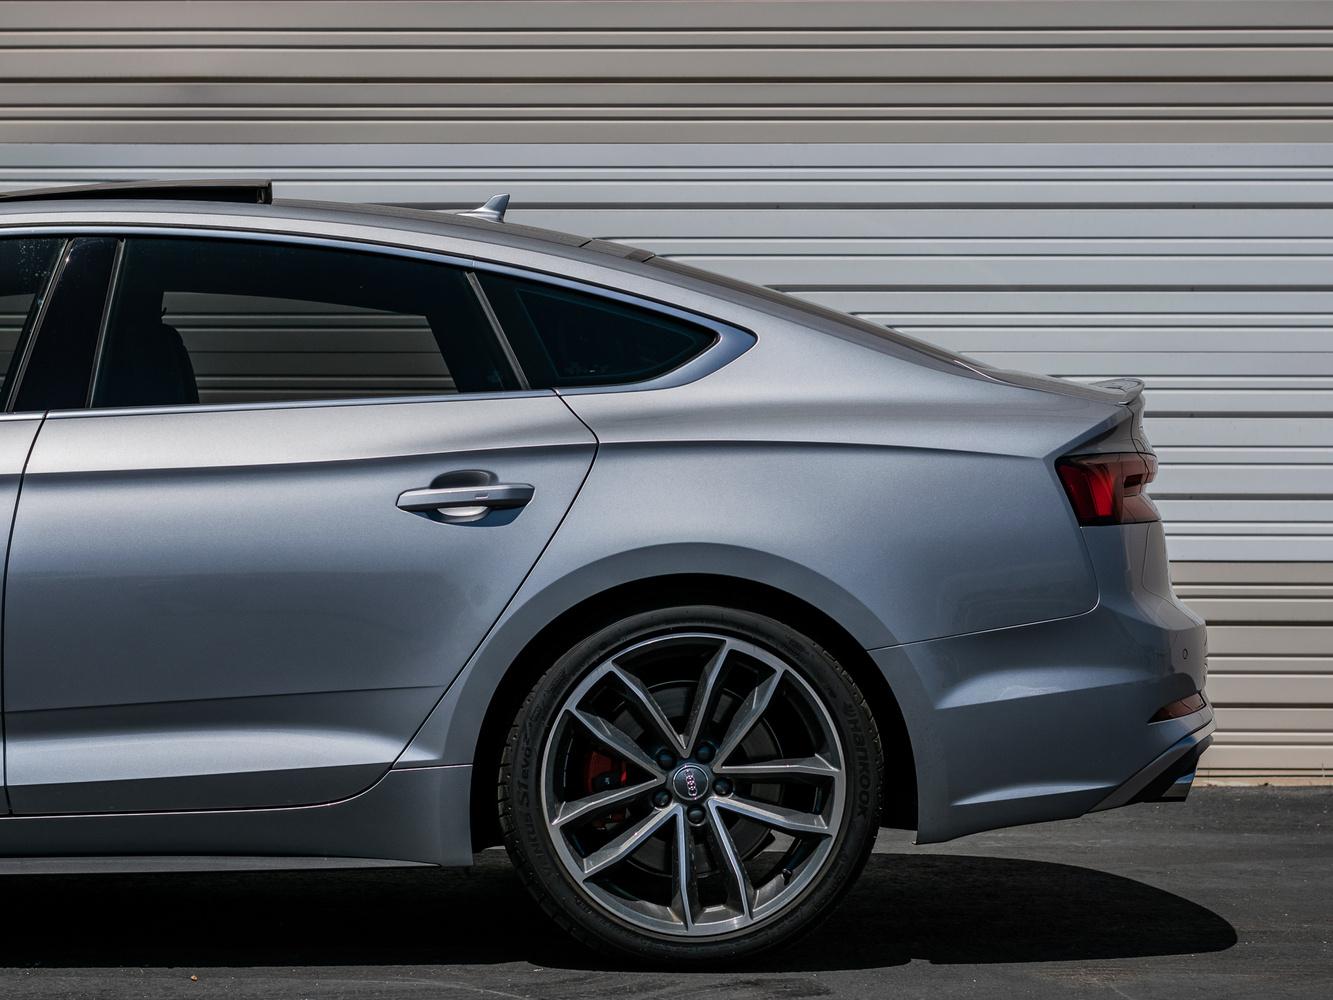 Audi S5 Sportback by Travis Pinney